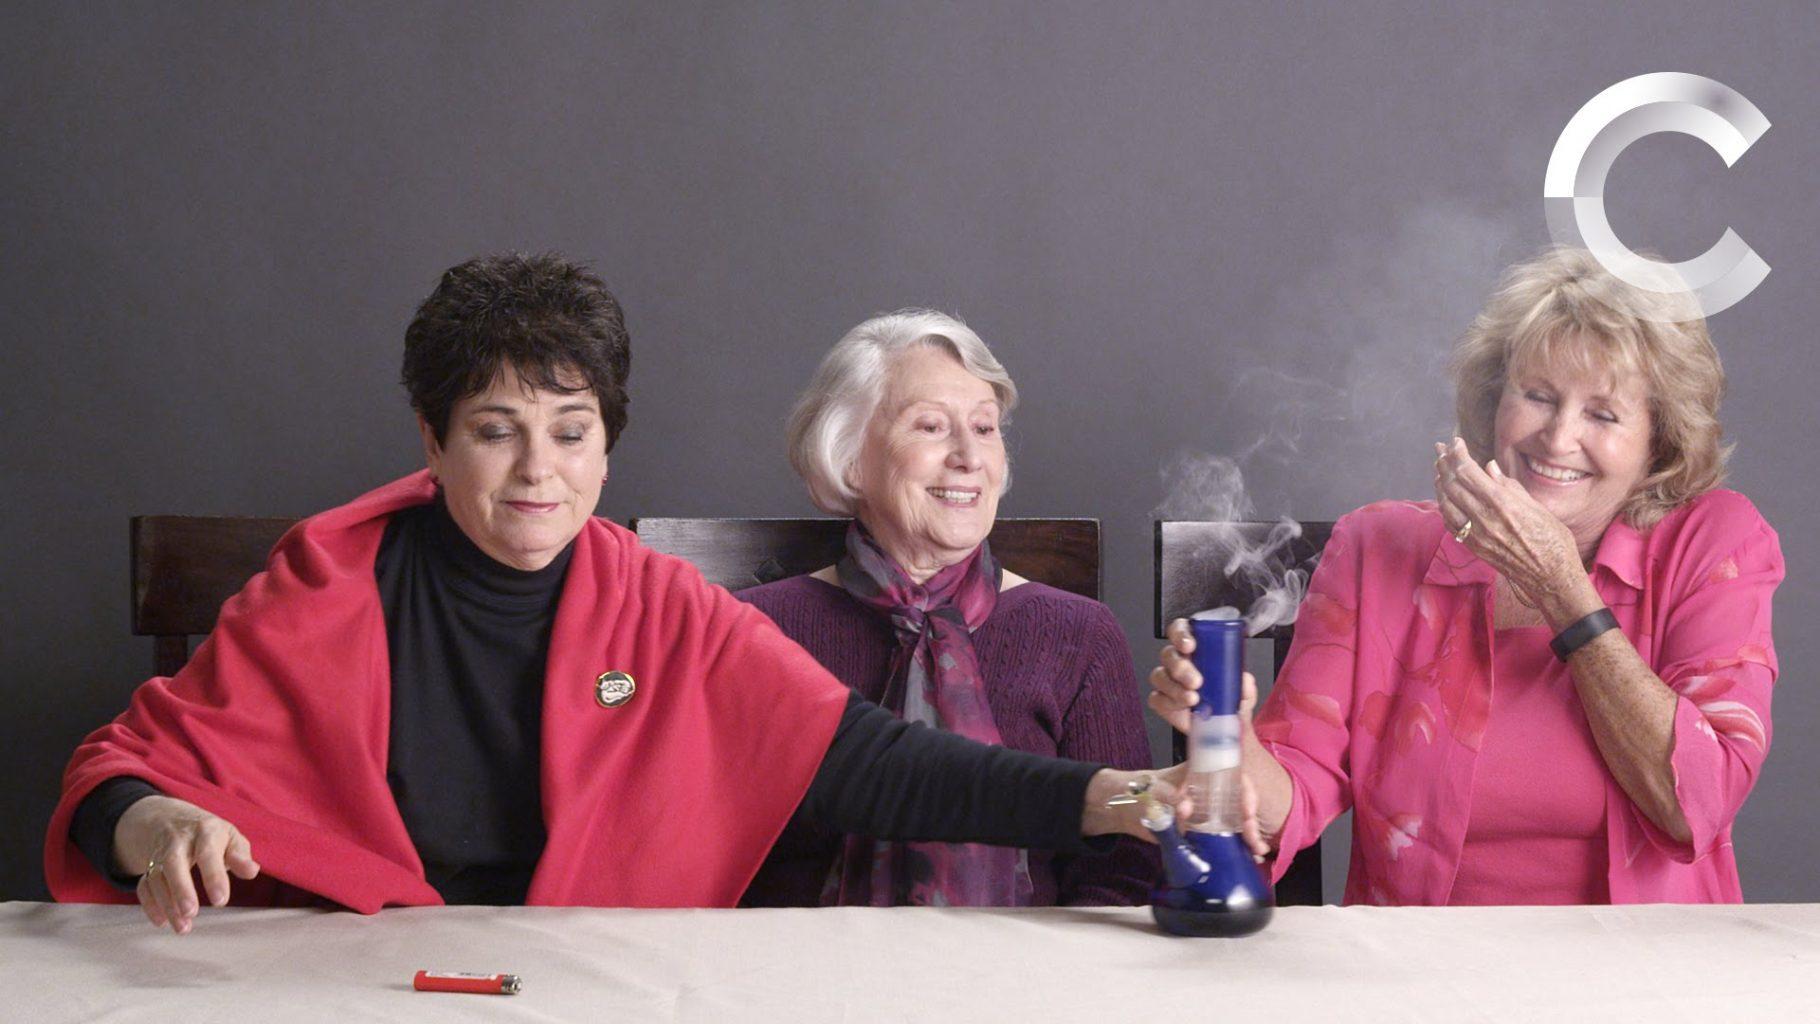 Senior Citizens Getting Stoned